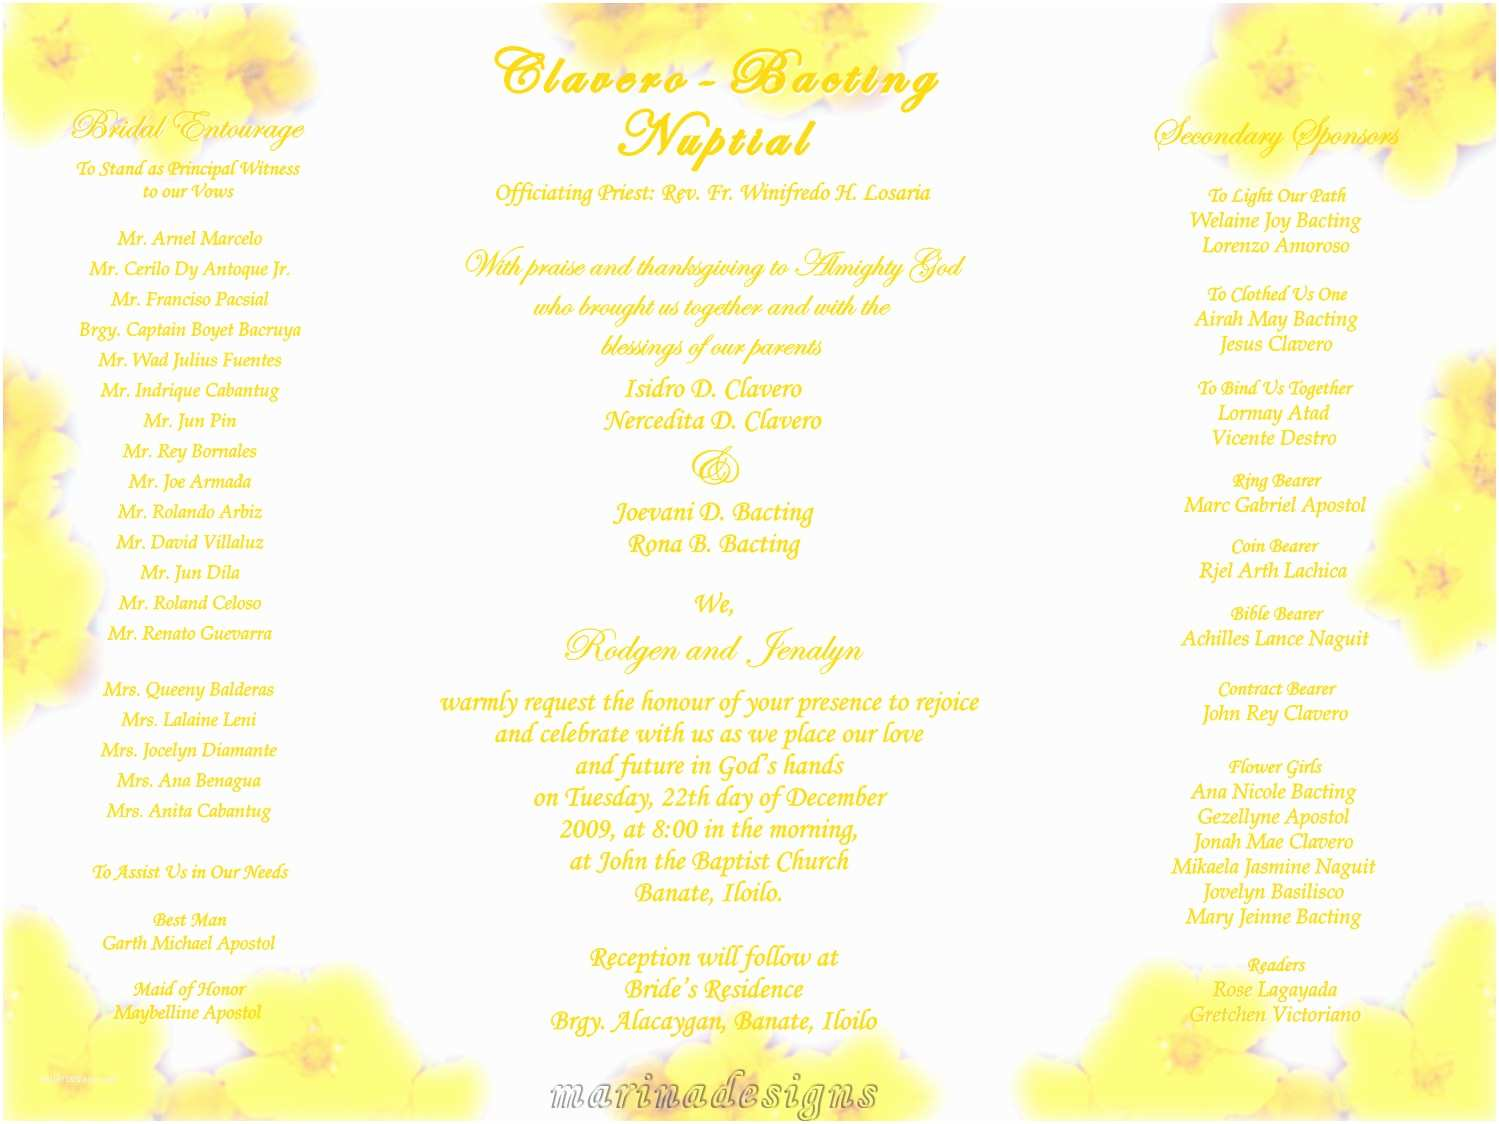 Filipino Wedding Invitation Sample Printable Wedding Invitation with Entourage Yaseen for